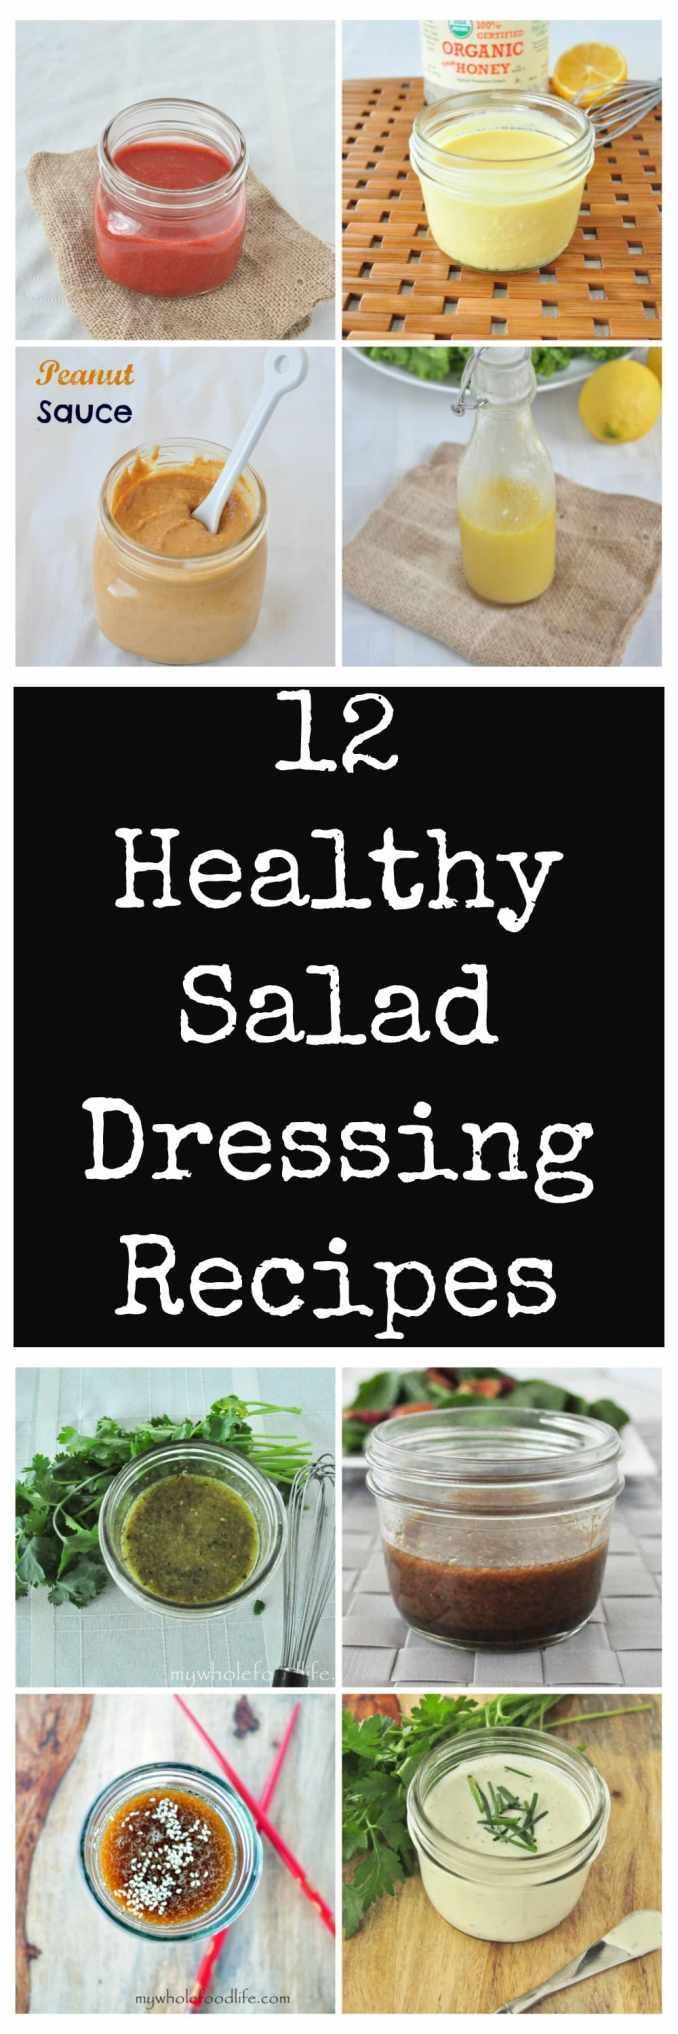 12 Healthy Salad Dressing Recipes - My Whole Food Life